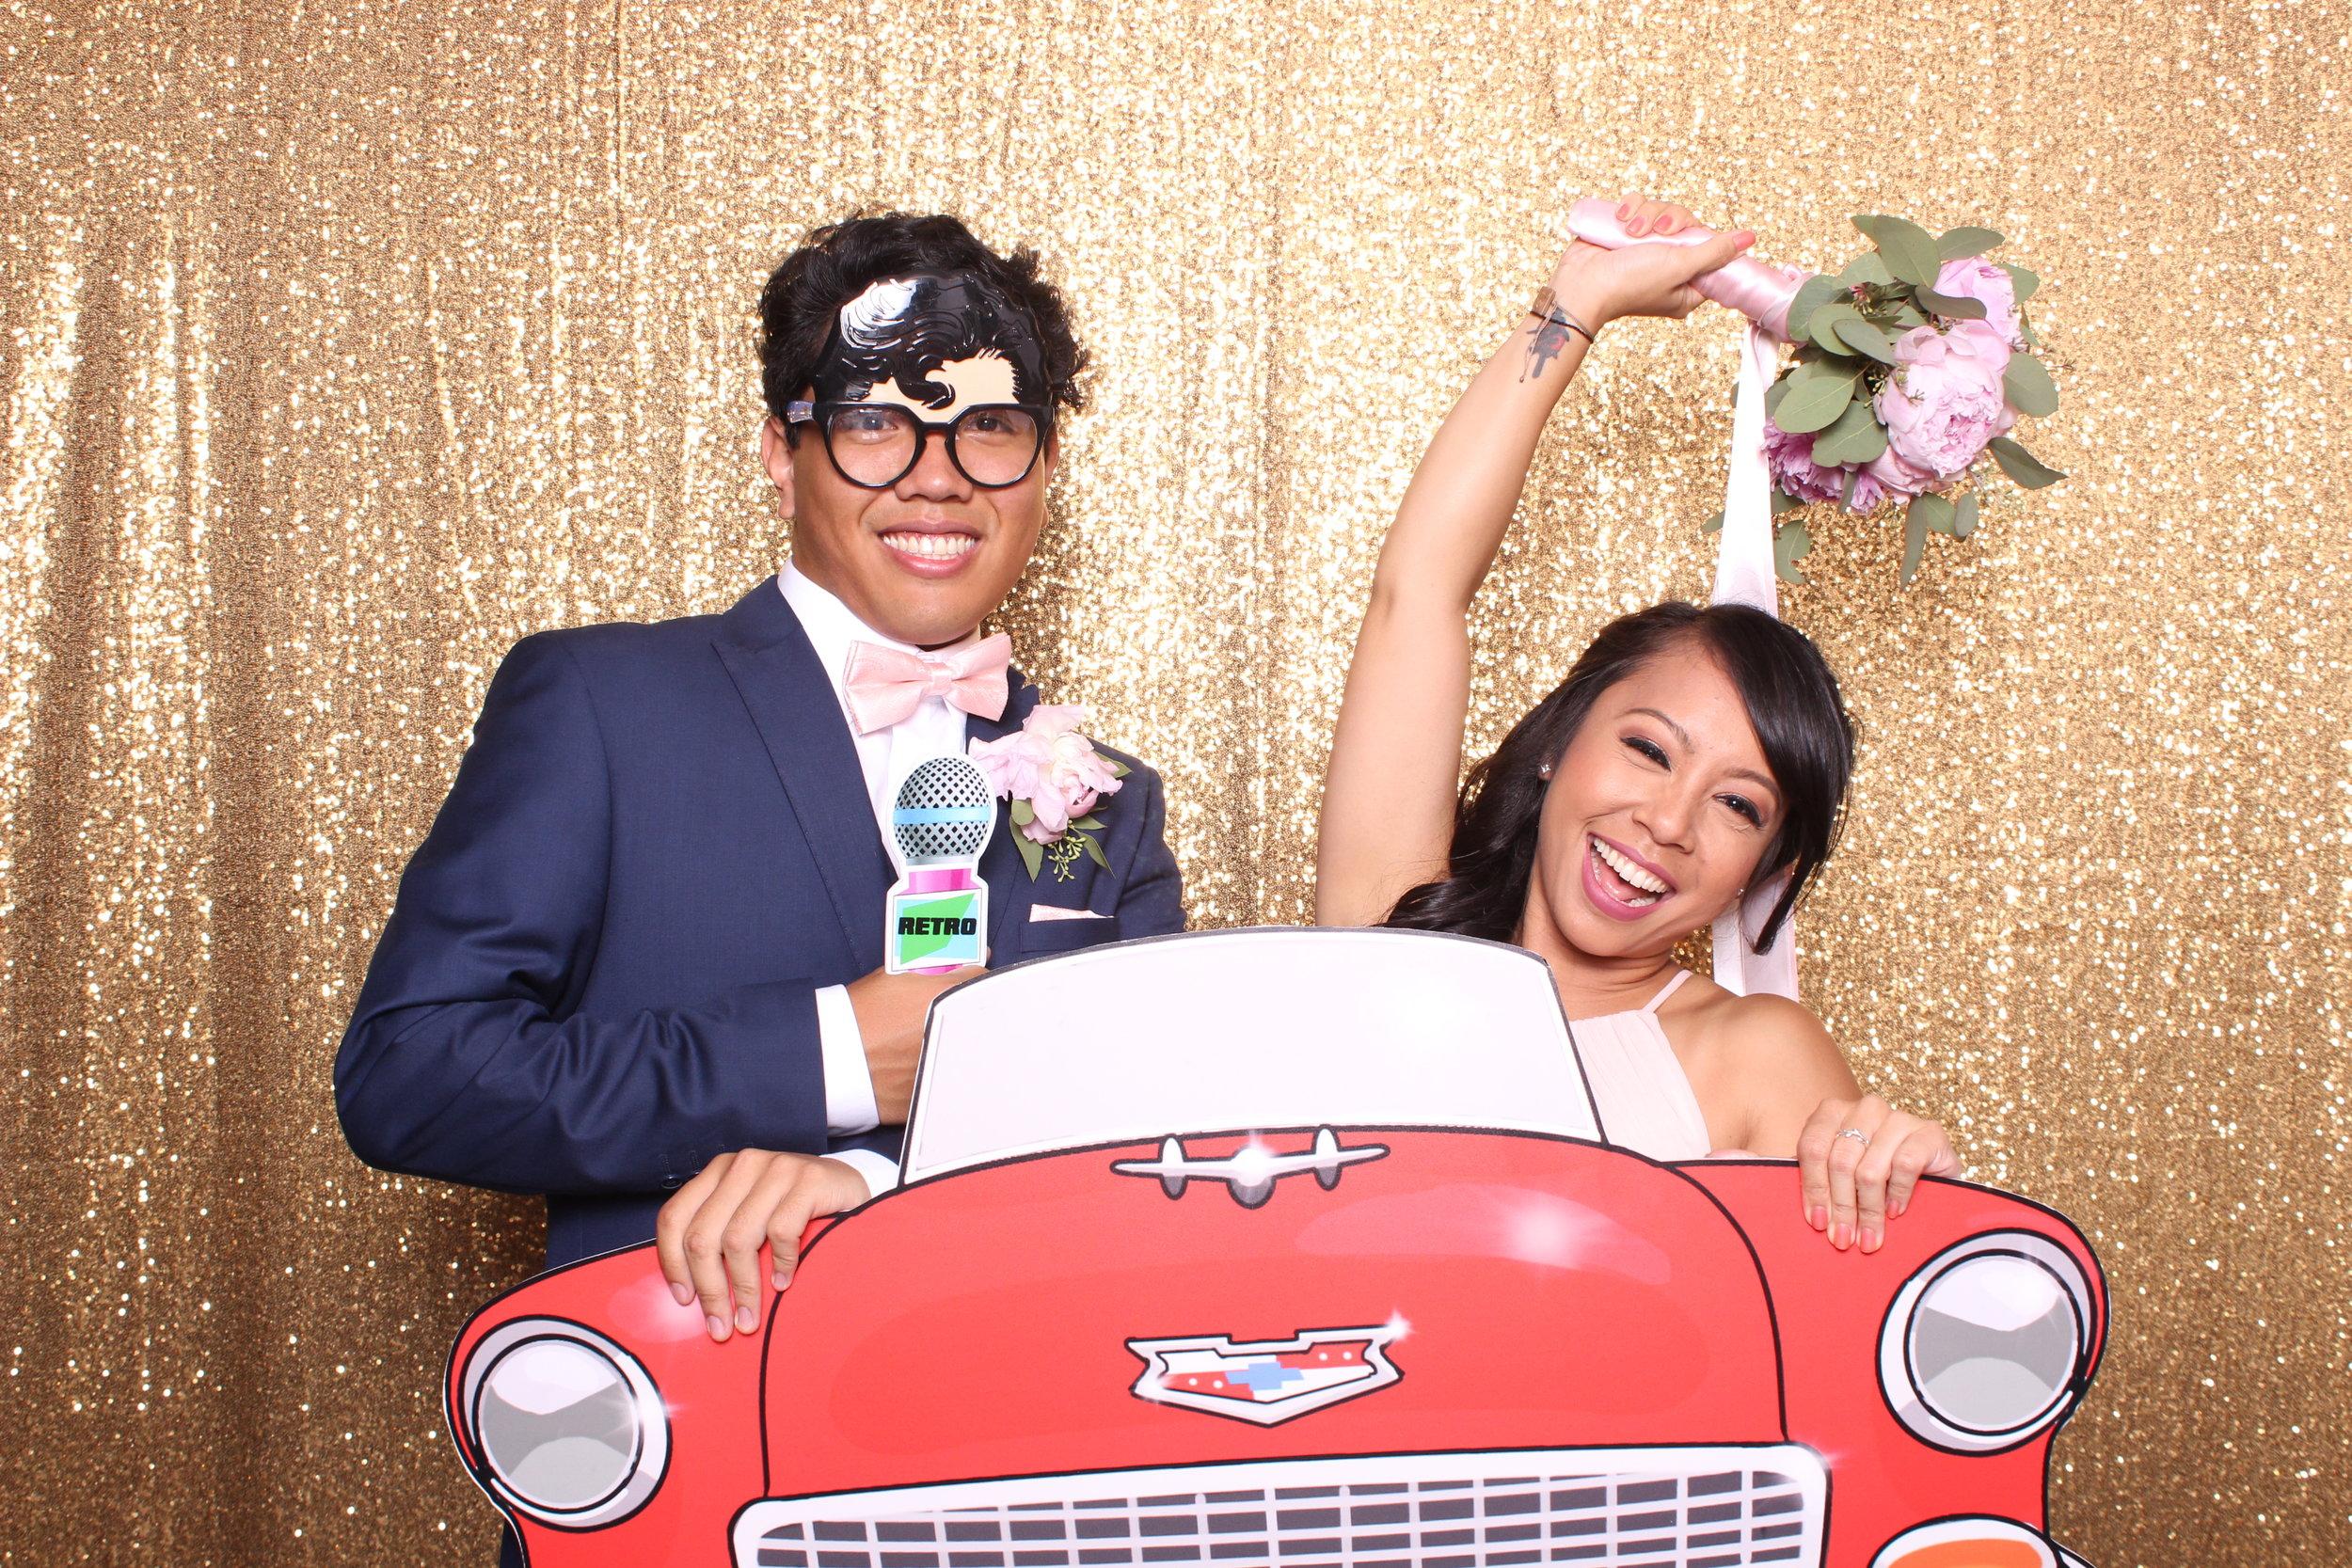 wedding photo booth prop.JPG